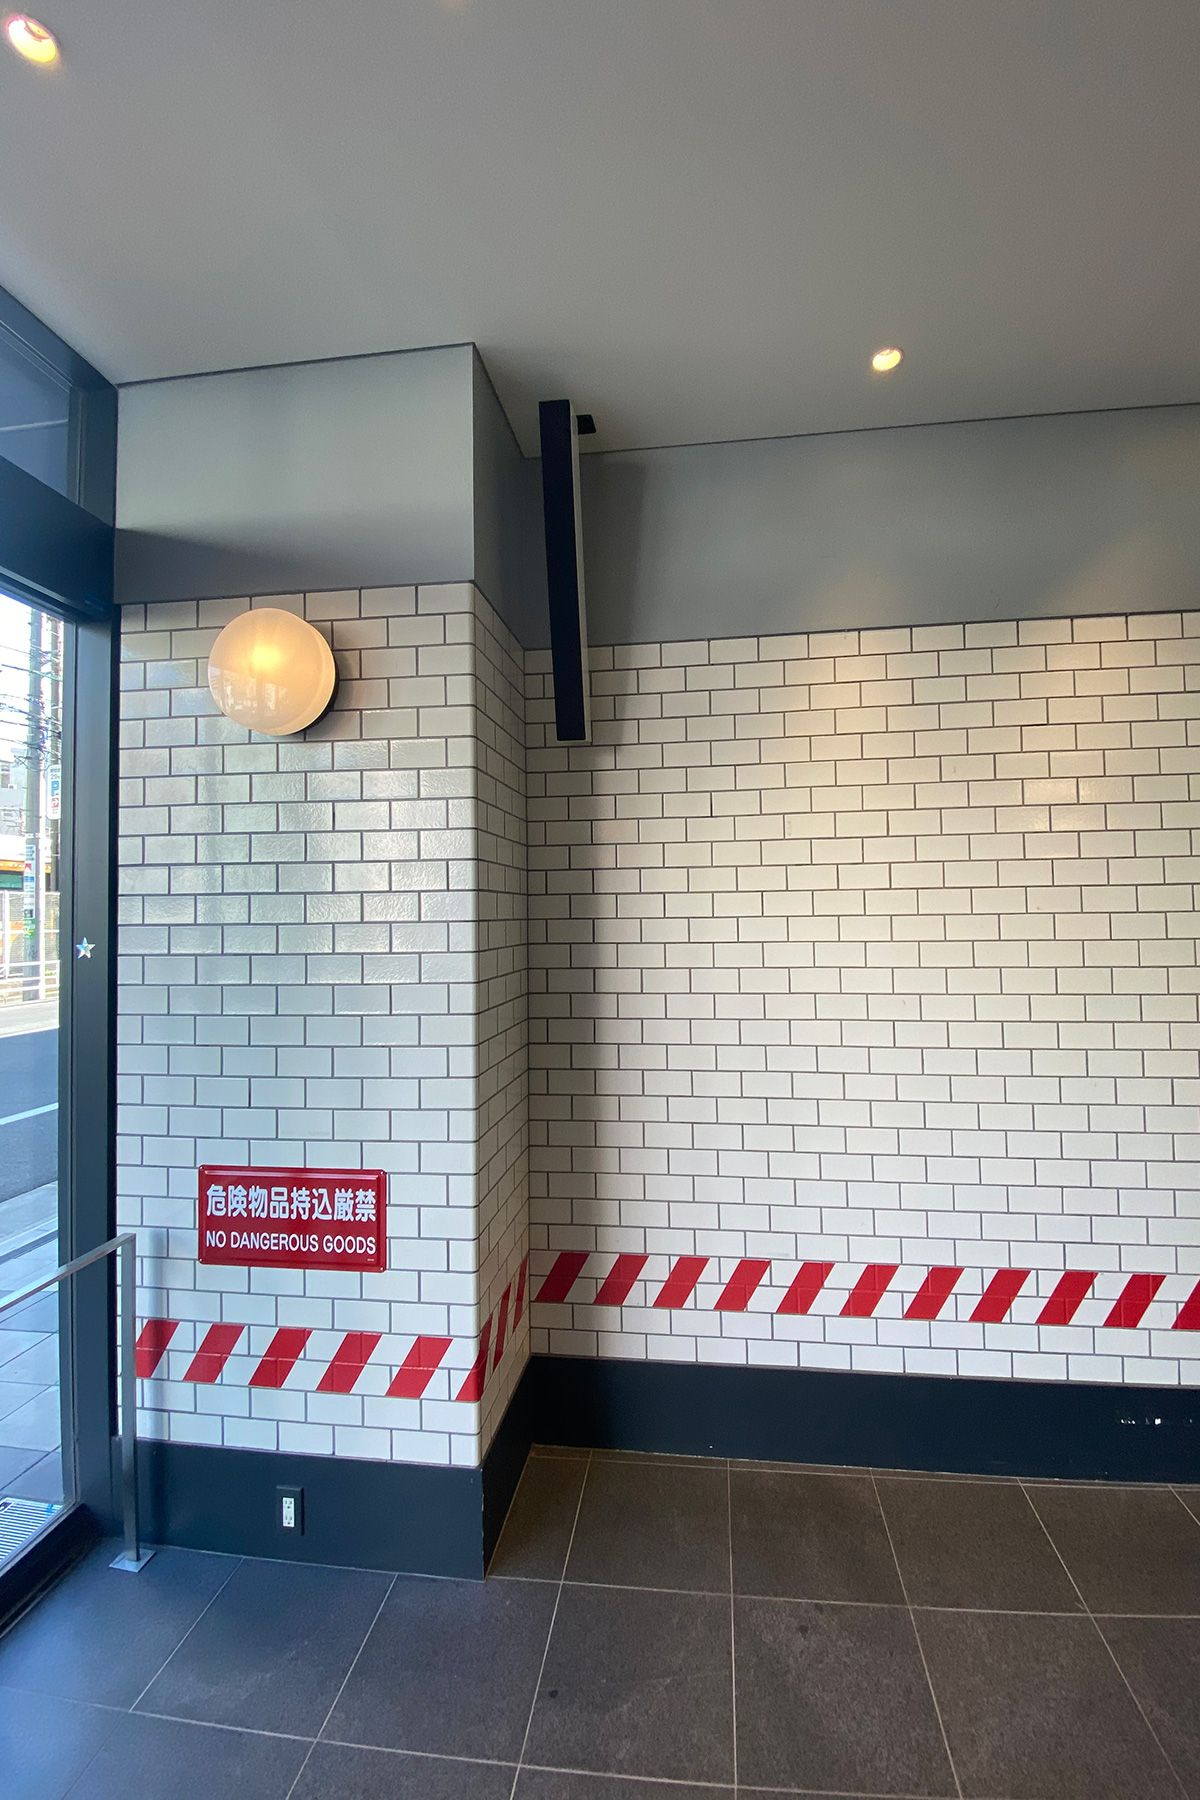 MUSTARD™️ HOTEL SHIBUYA (マスタードホテル シブヤ)エントランス壁面はPOP